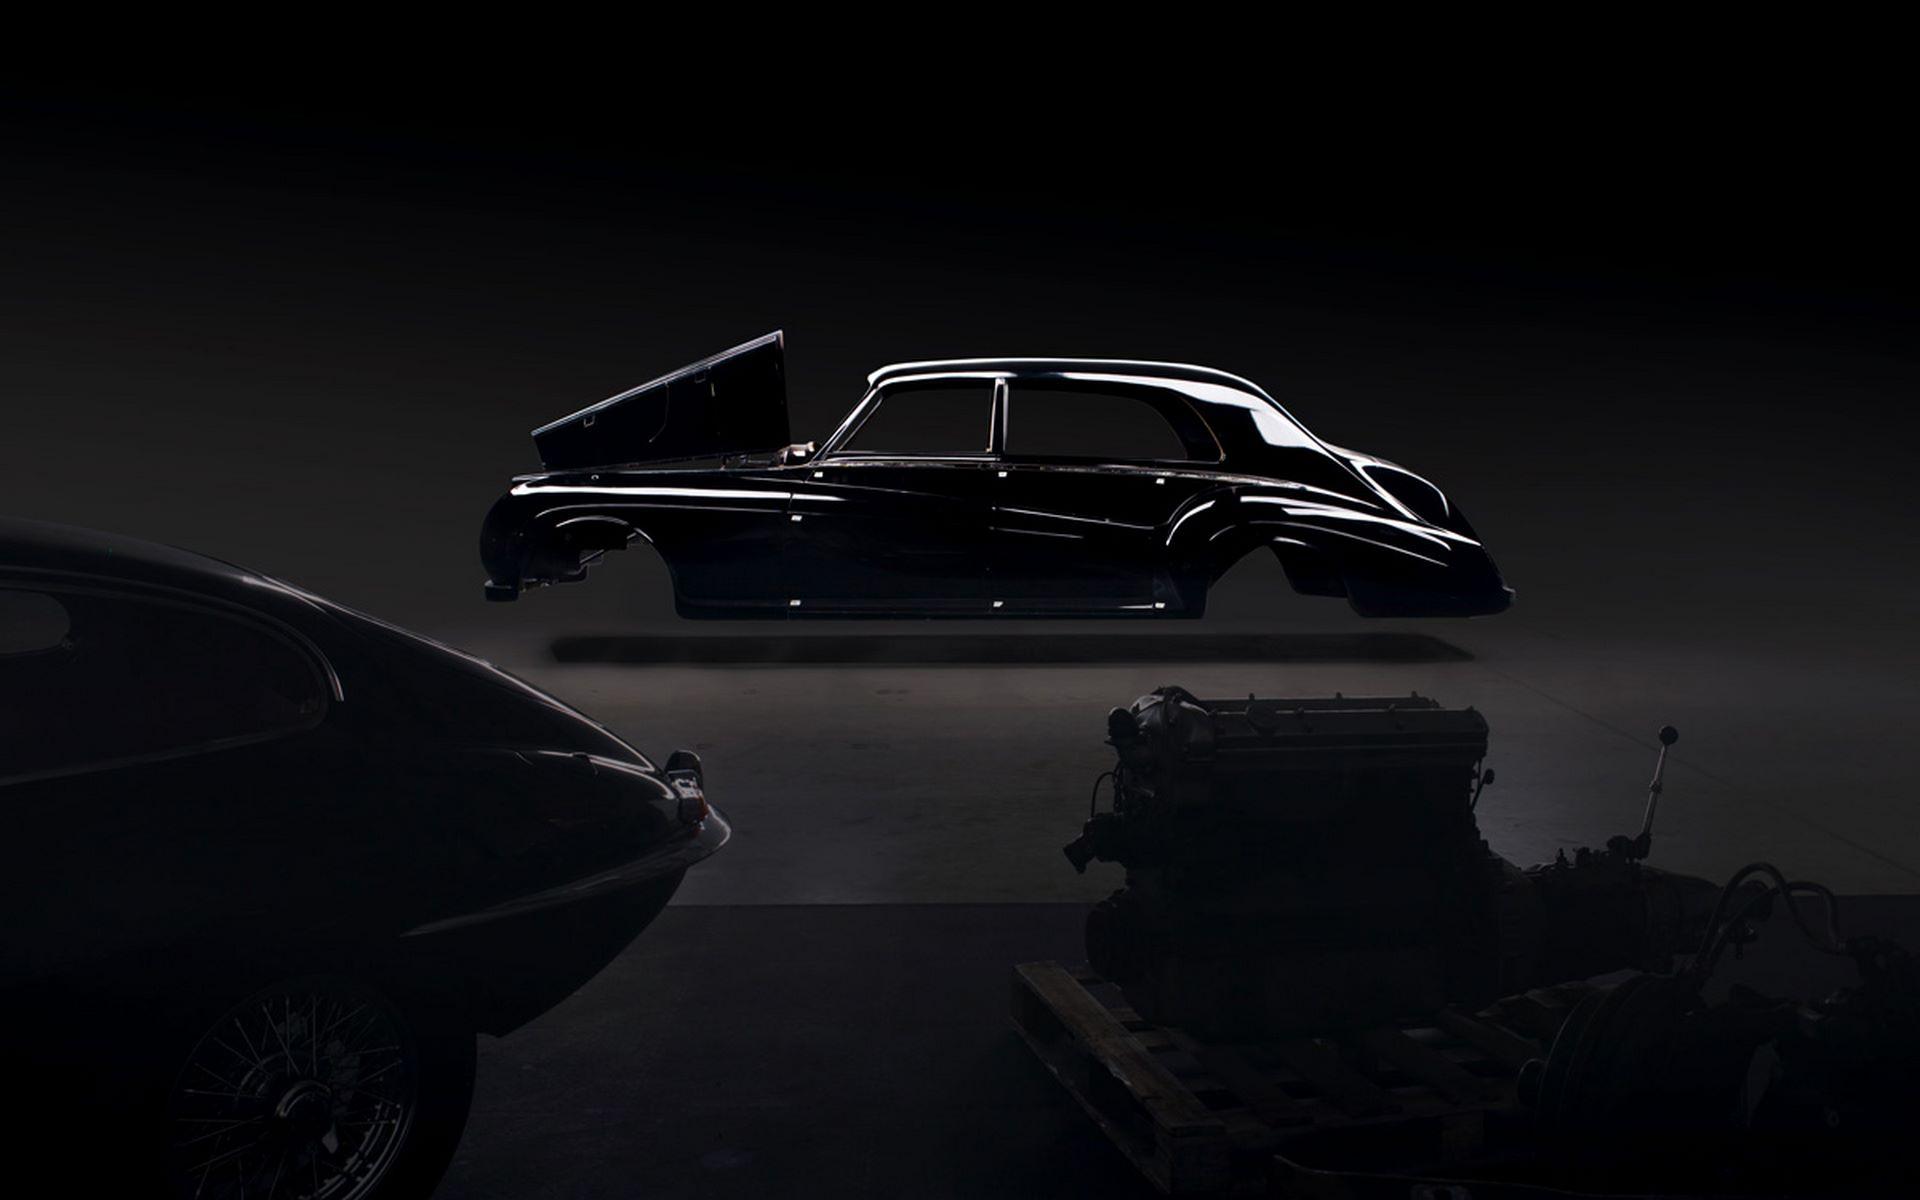 Electris-Rolls-Royce-Phantom-V-and-Silver-Cloud-by-Lunaz-31